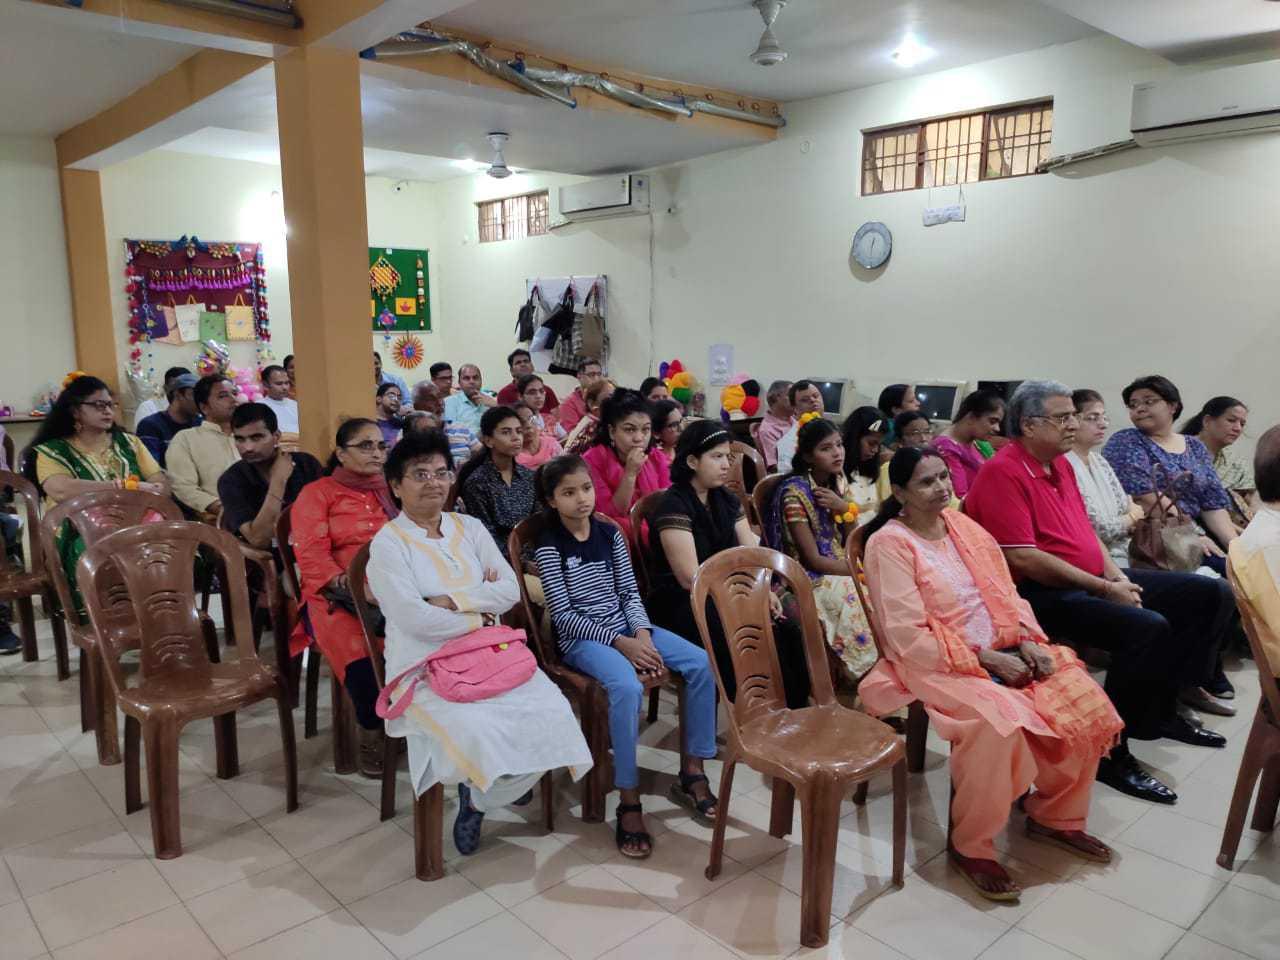 gathering-at-Pre-Diwali-celebration-2